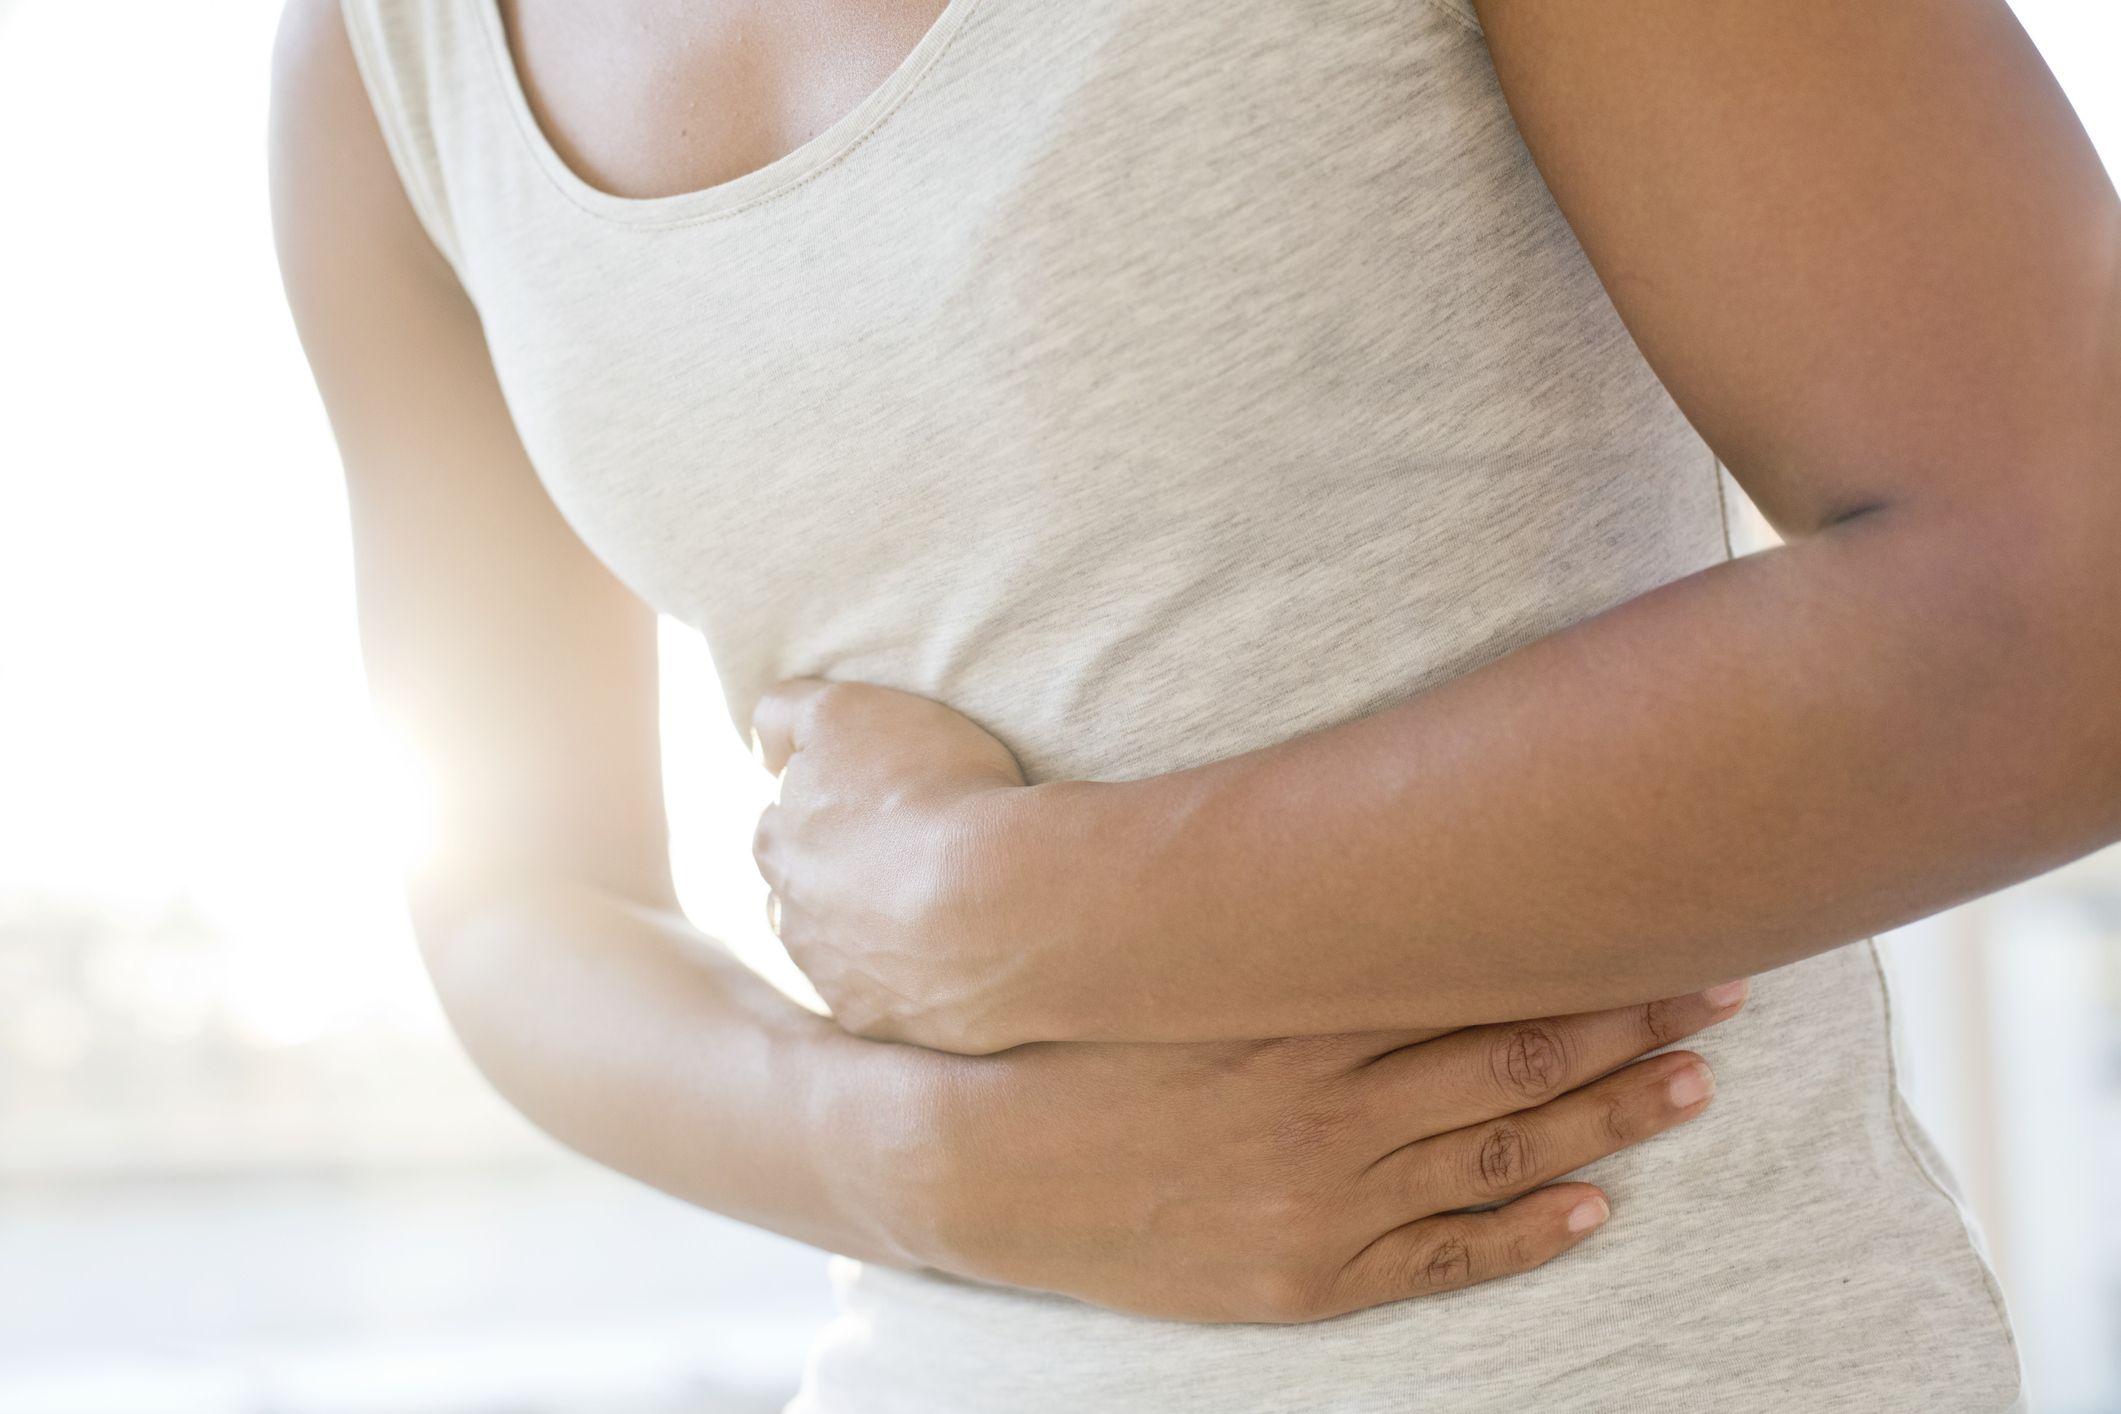 abdominal cancer symptoms female